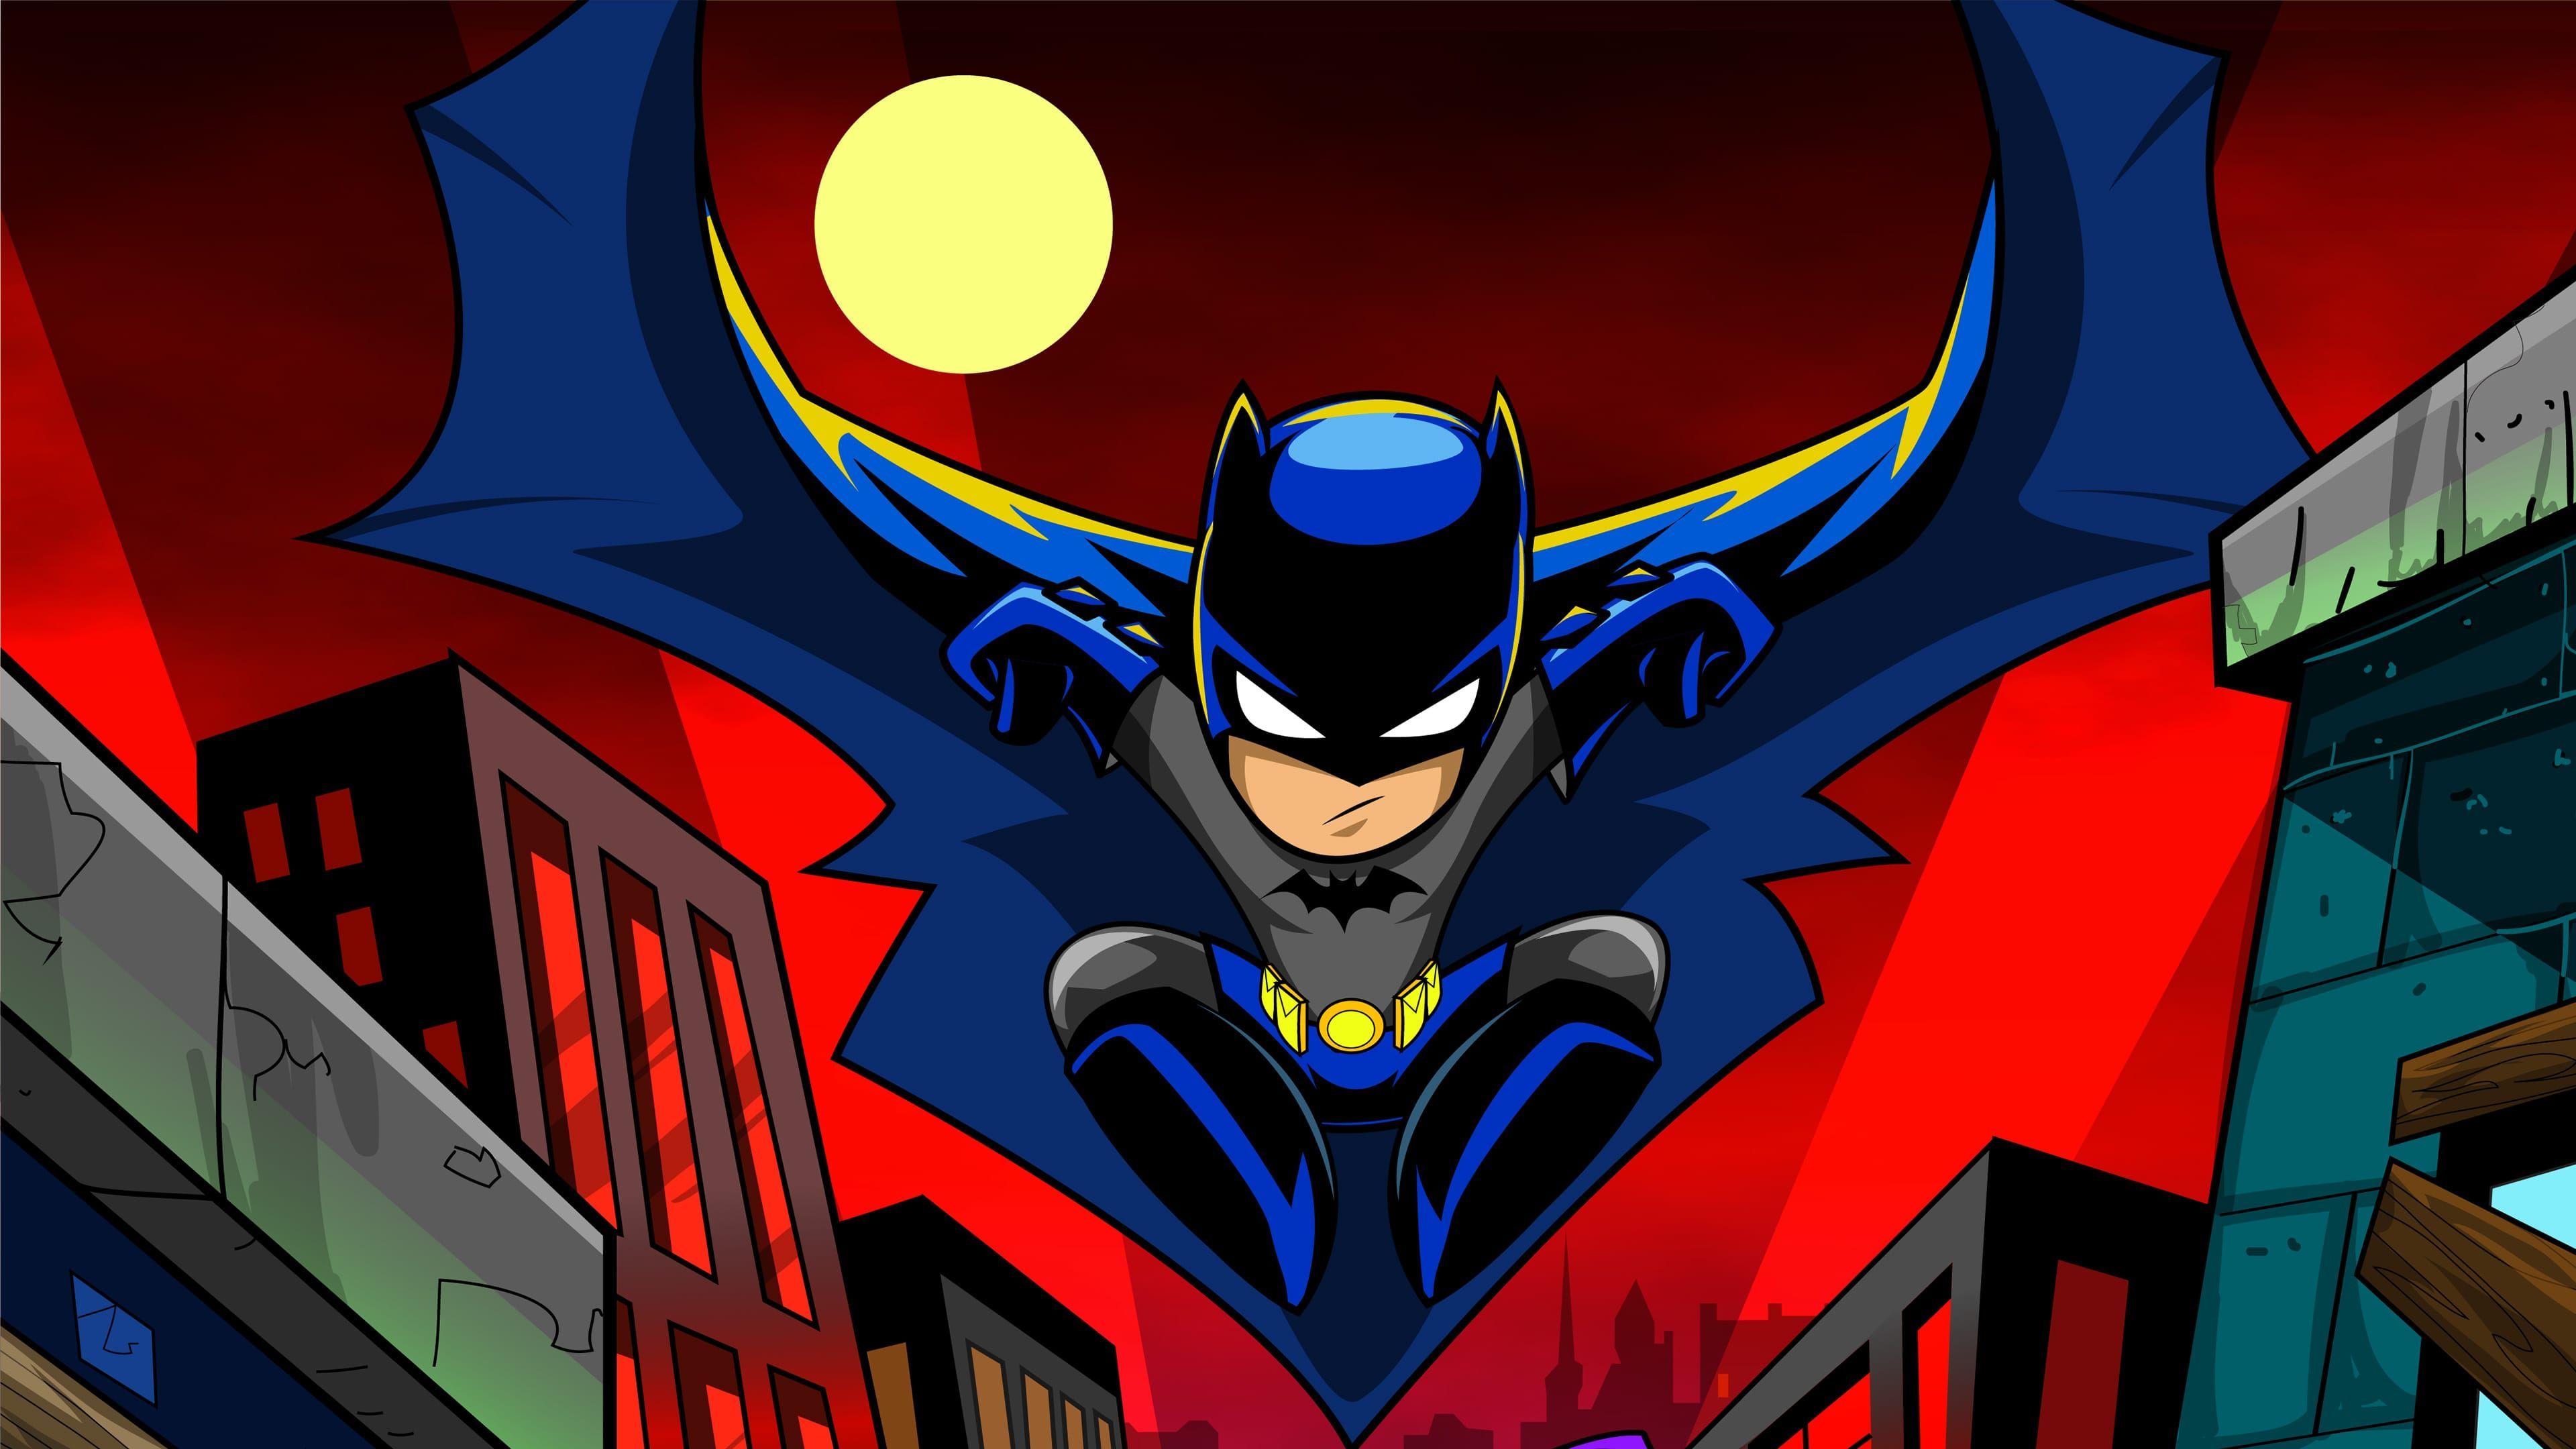 Batman Cartoon Art 4k Awesome Desktop Hd Wallpaper Batman Wallpaper Cartoon Wallpaper Cartoon Wallpaper Hd